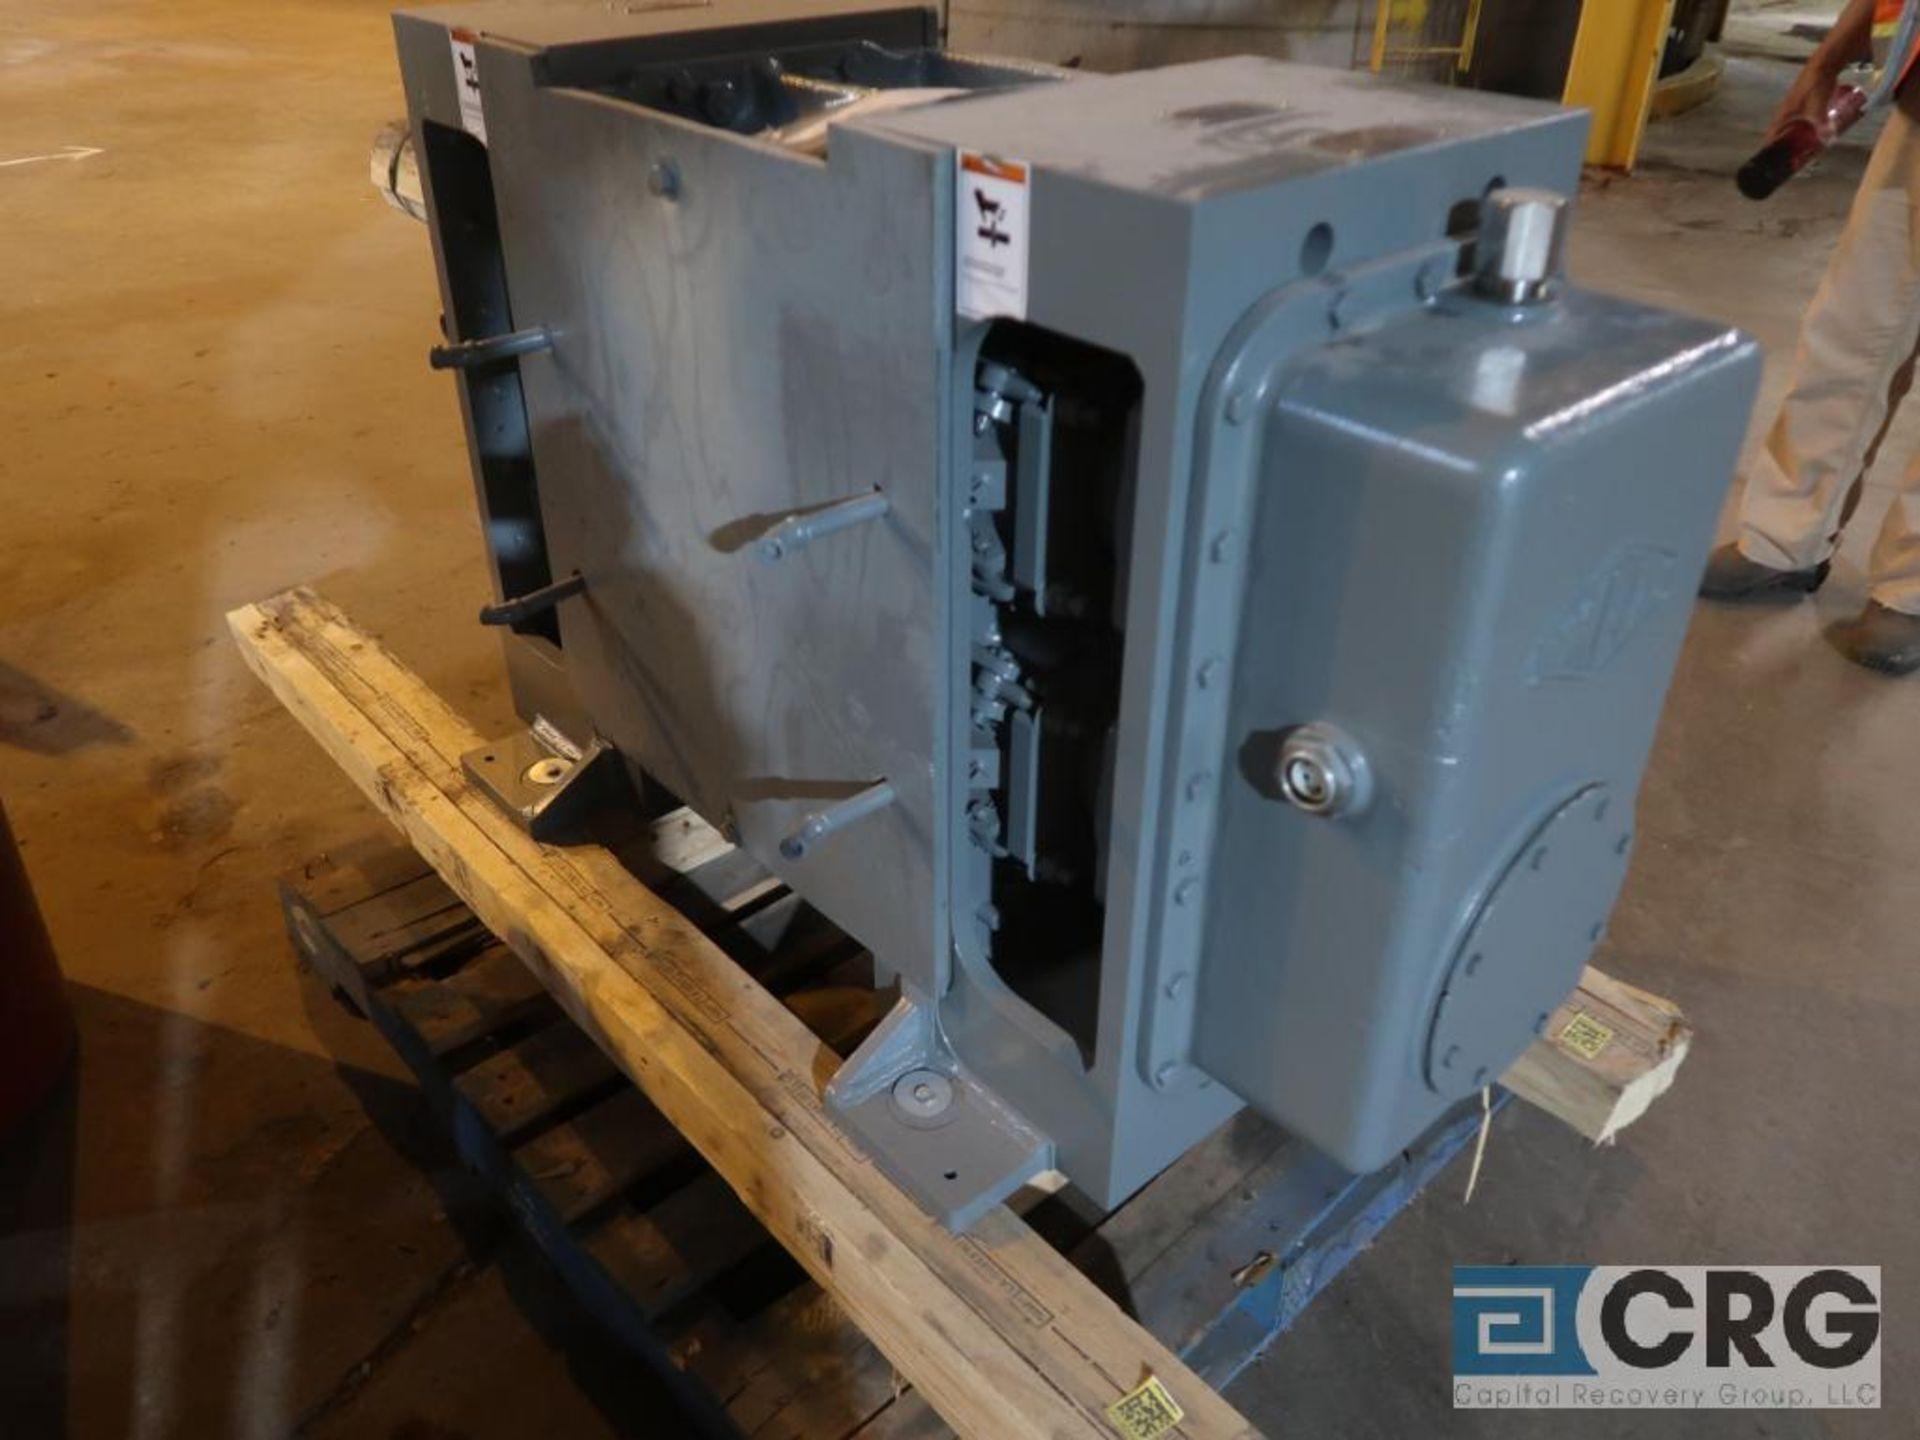 Valmet 54321 R20 stock pump, s/n 2020 (Main Yard) - Image 2 of 3